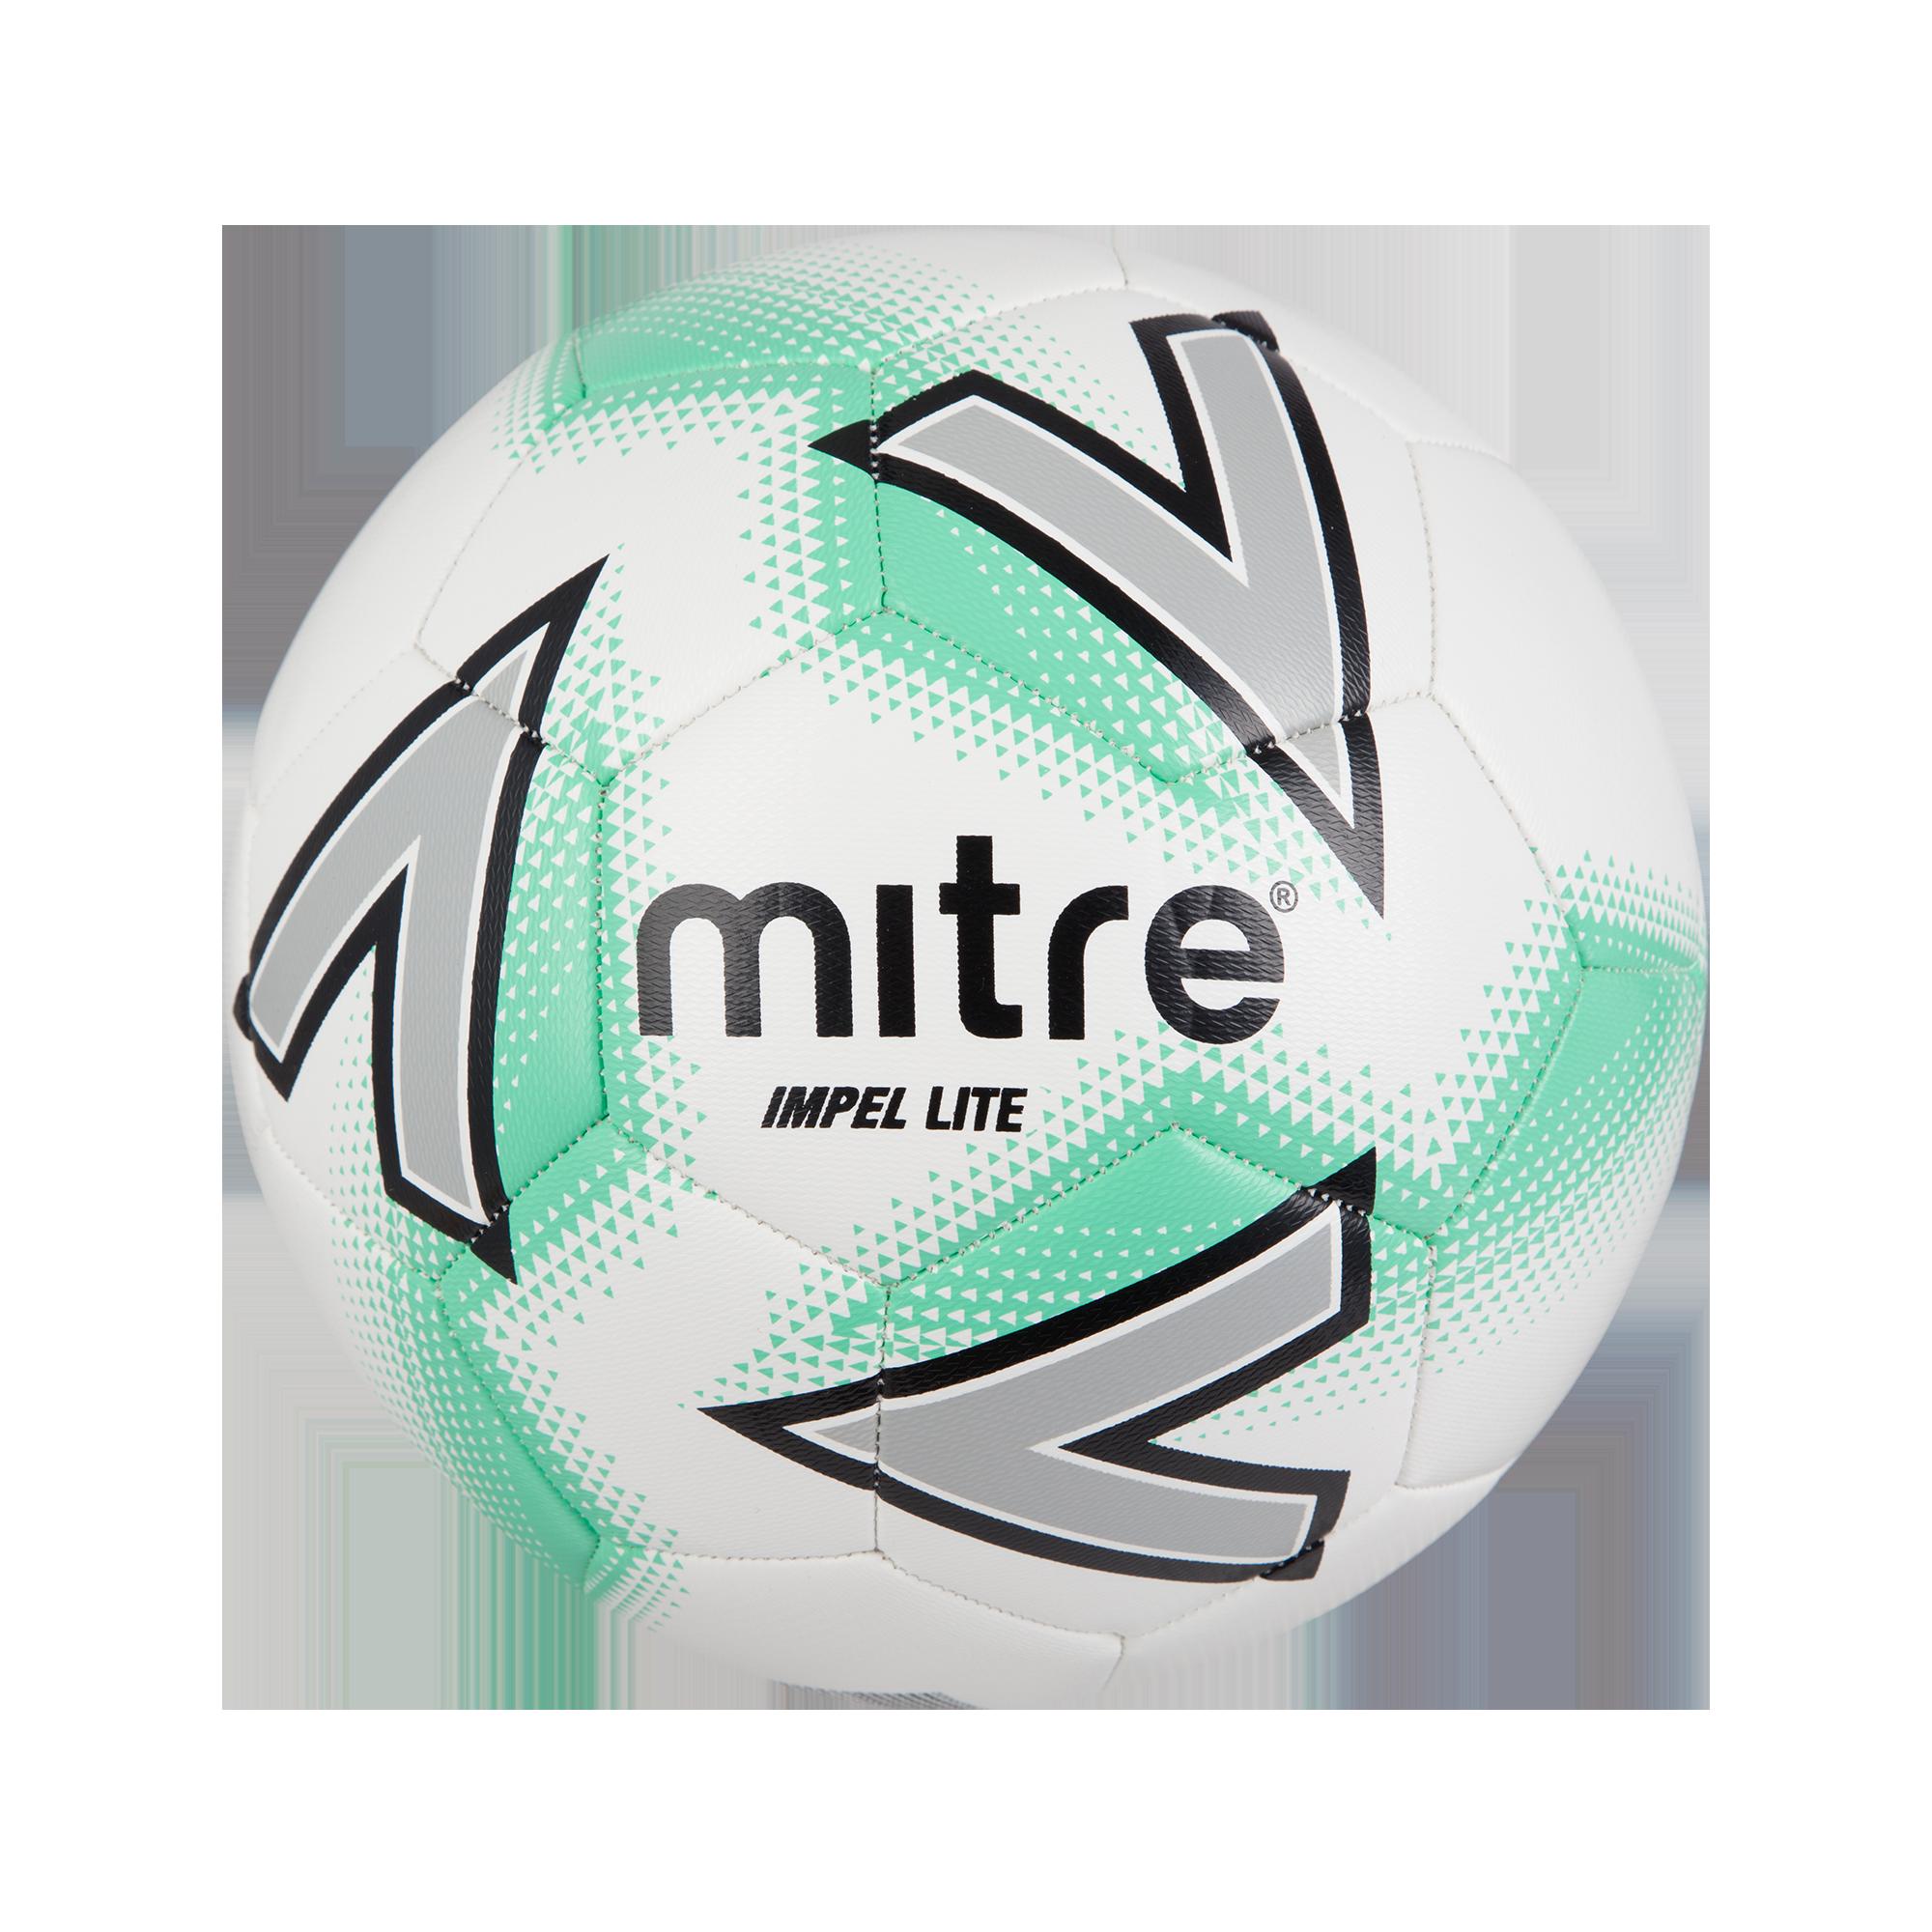 Mitre Impel Lite 290 - White/Green - Size 4